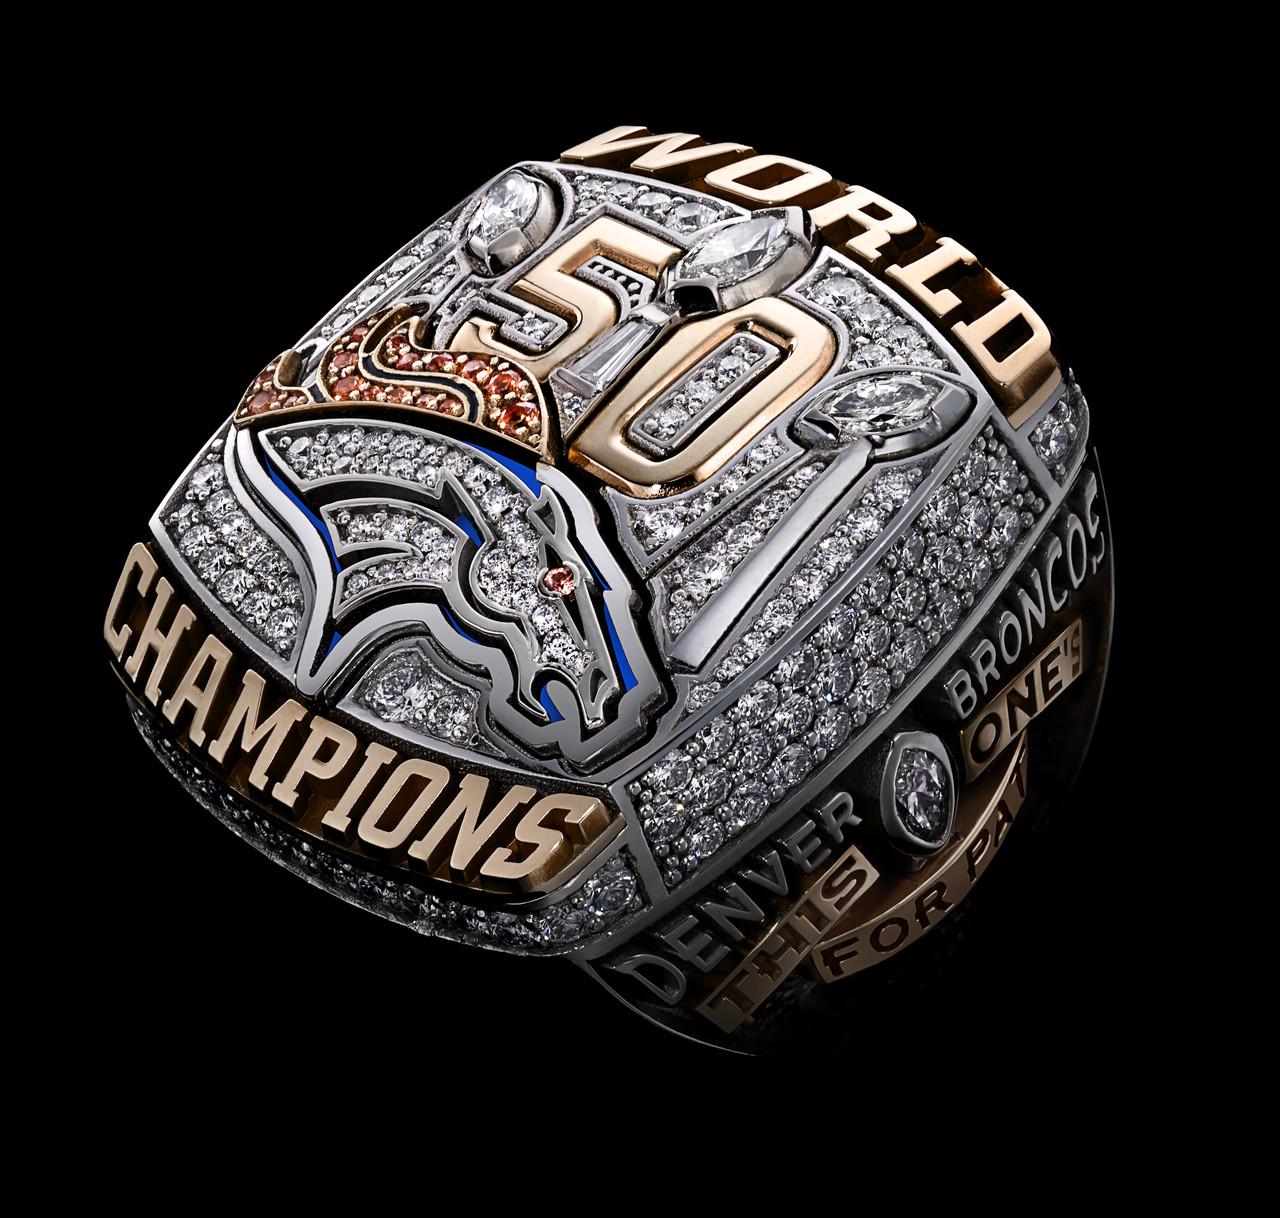 Denver Broncos 2016 champions ring